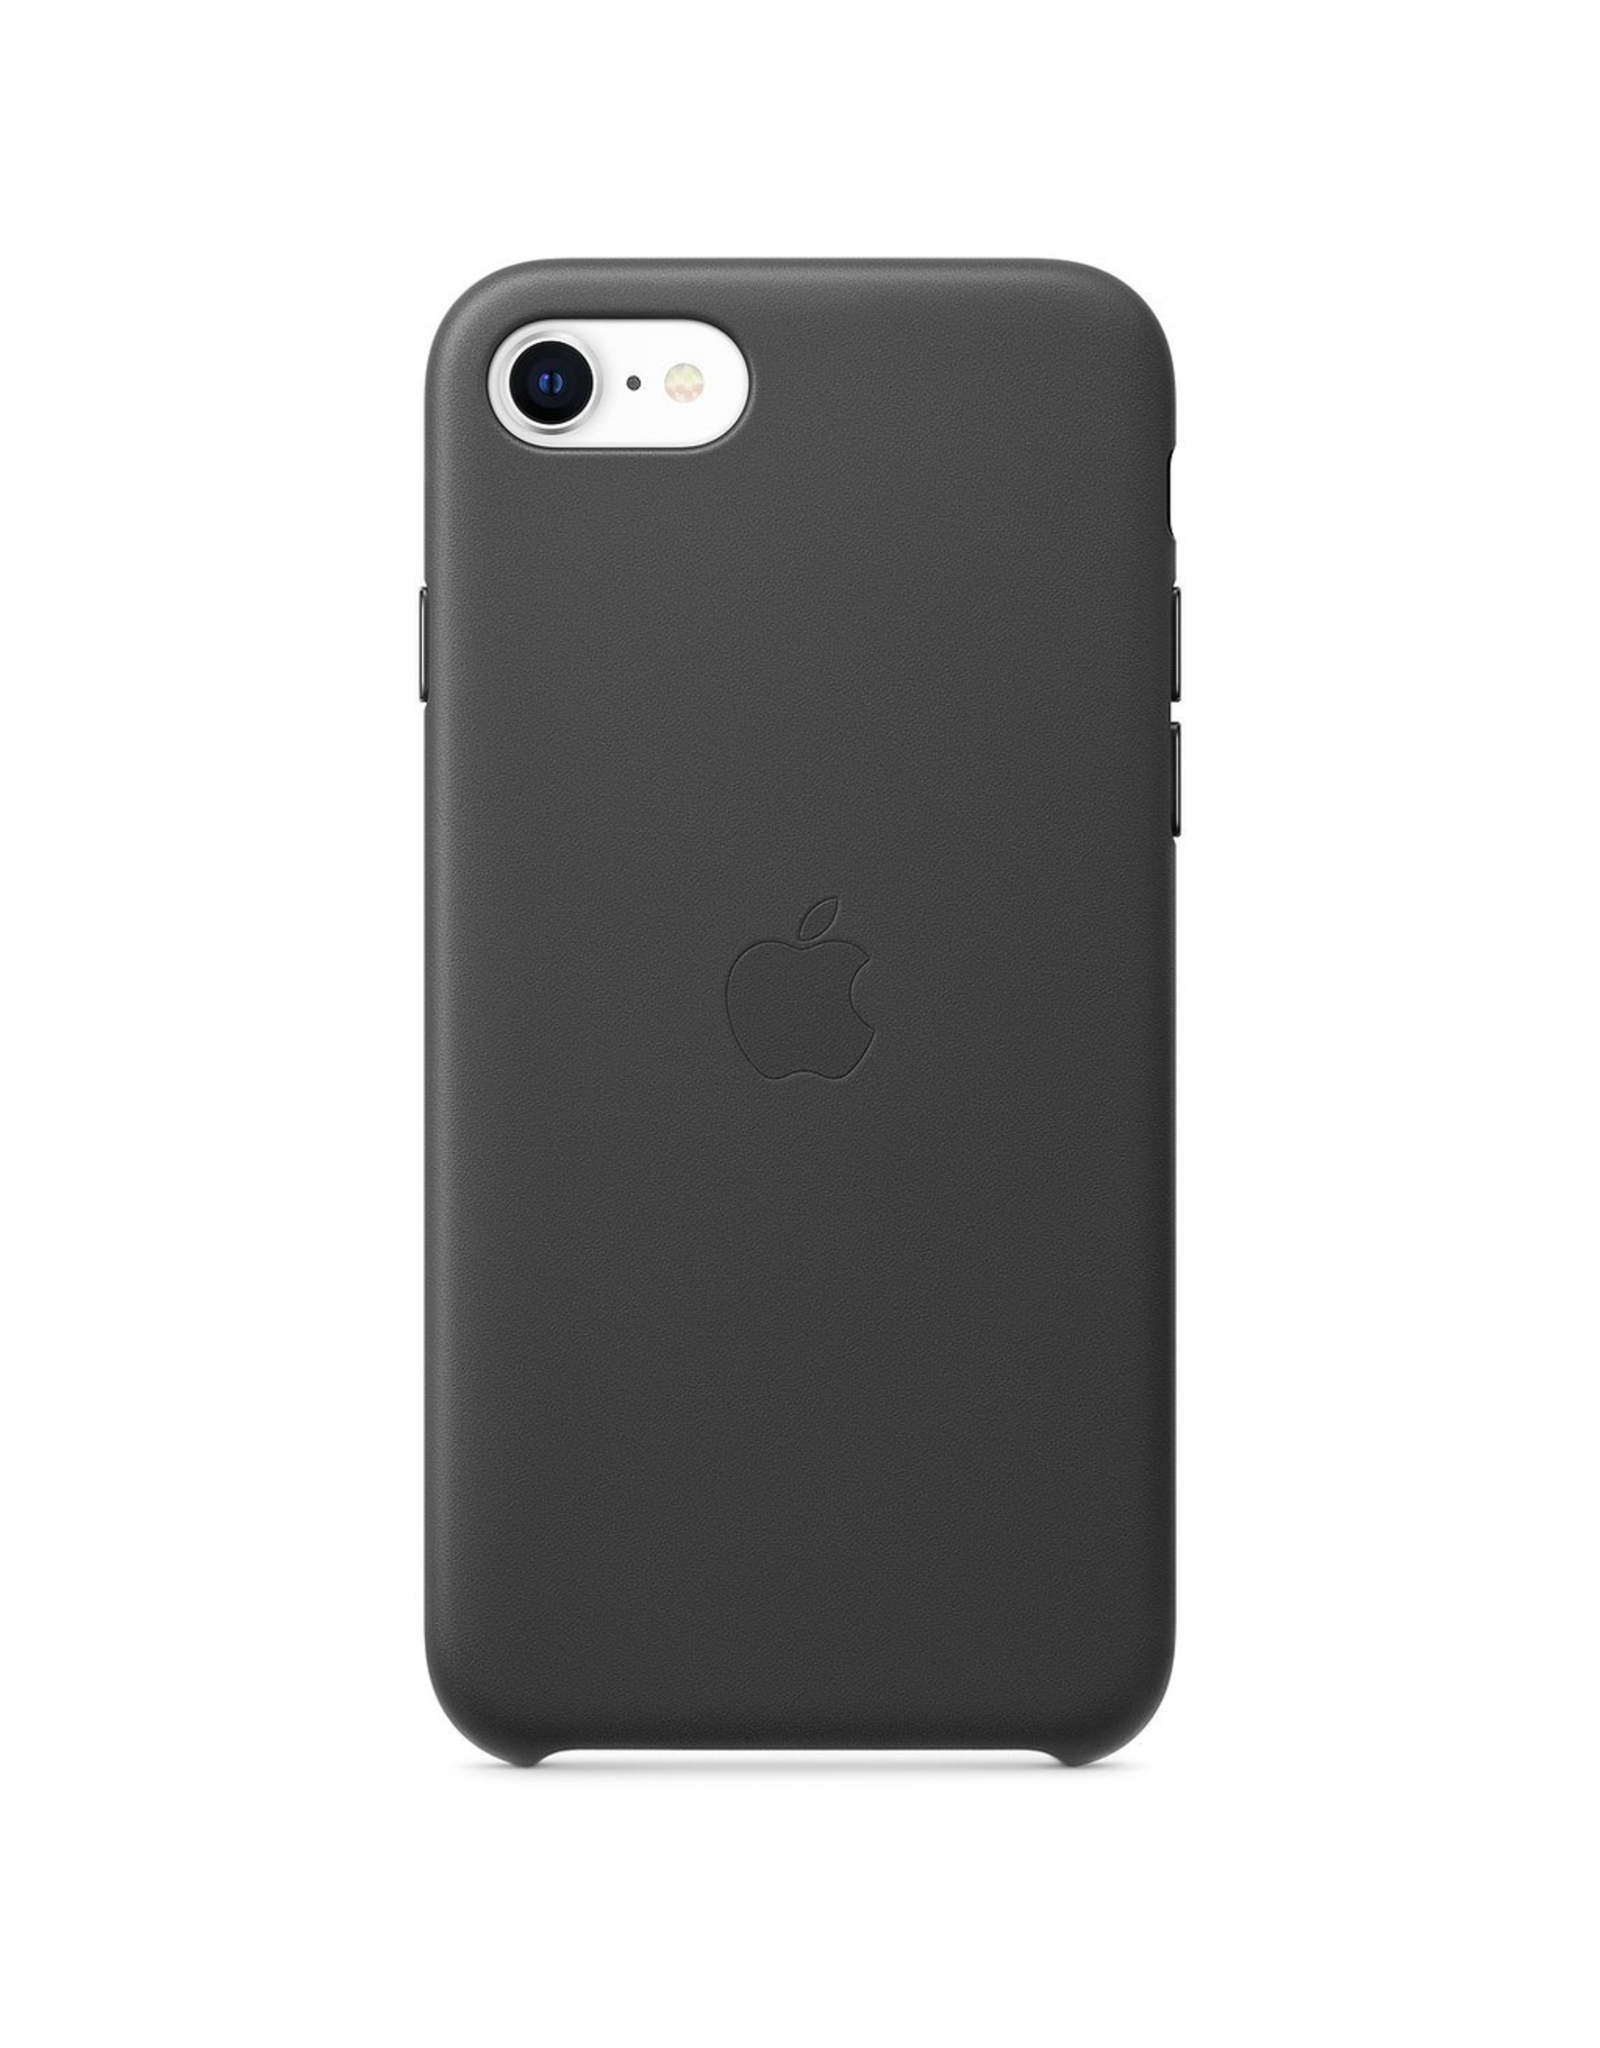 Apple Apple iPhone SE Leather Case - Black